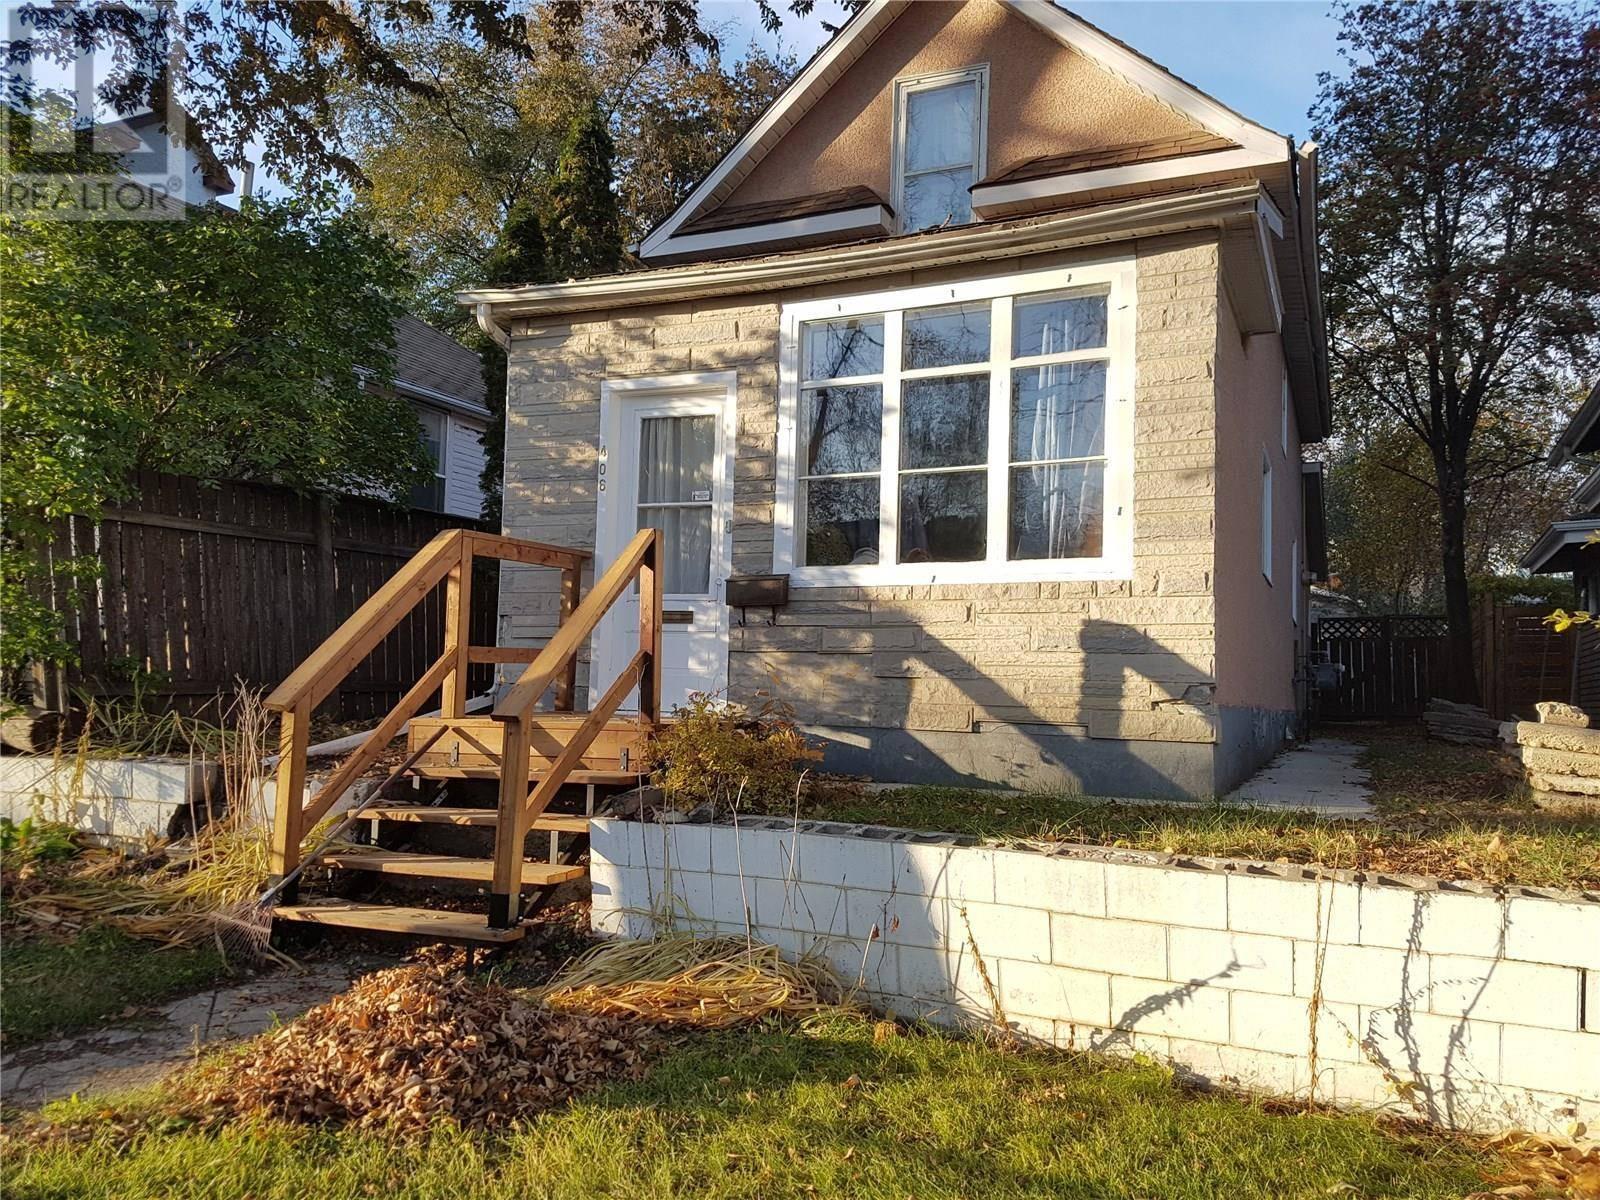 House for sale at 406 26th St W Saskatoon Saskatchewan - MLS: SK789559